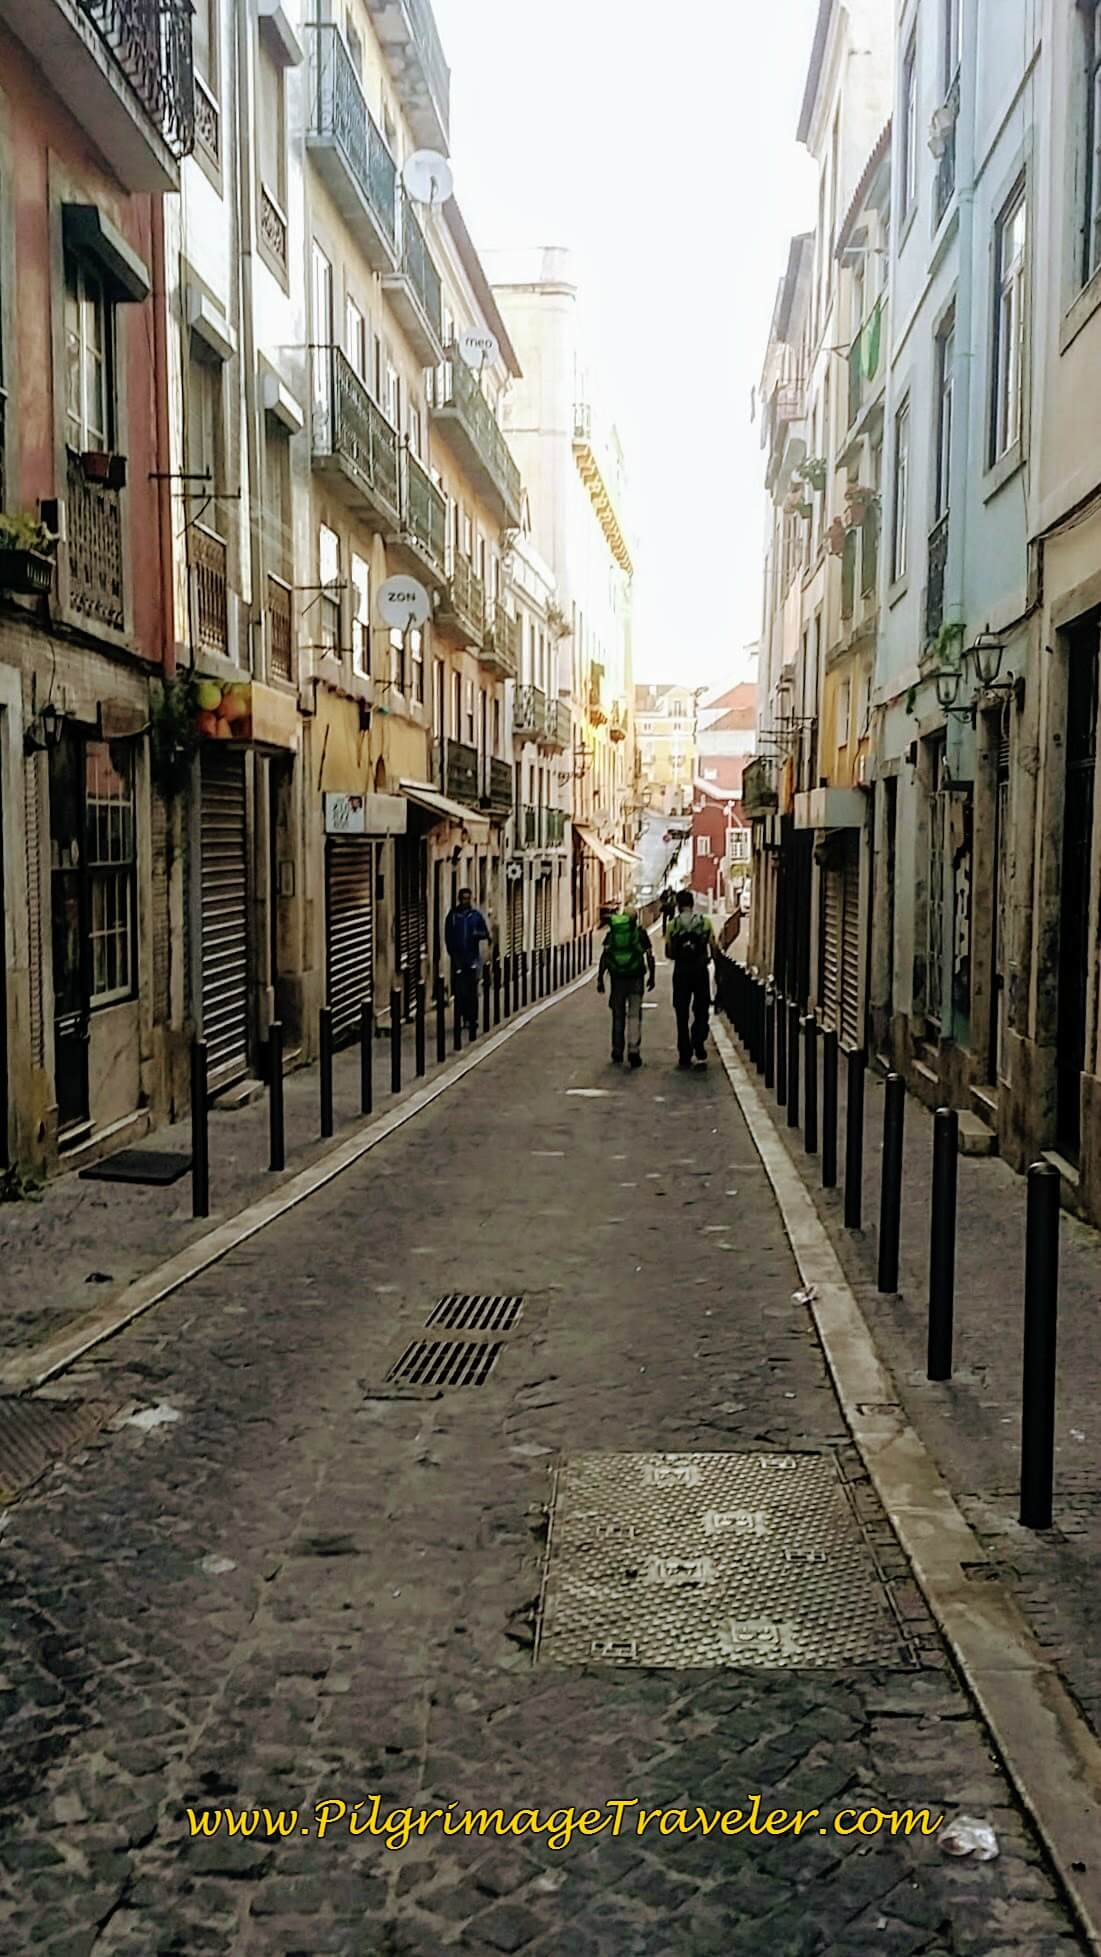 Rua dos Remédios, Alfama district in Lisbon, Portugal